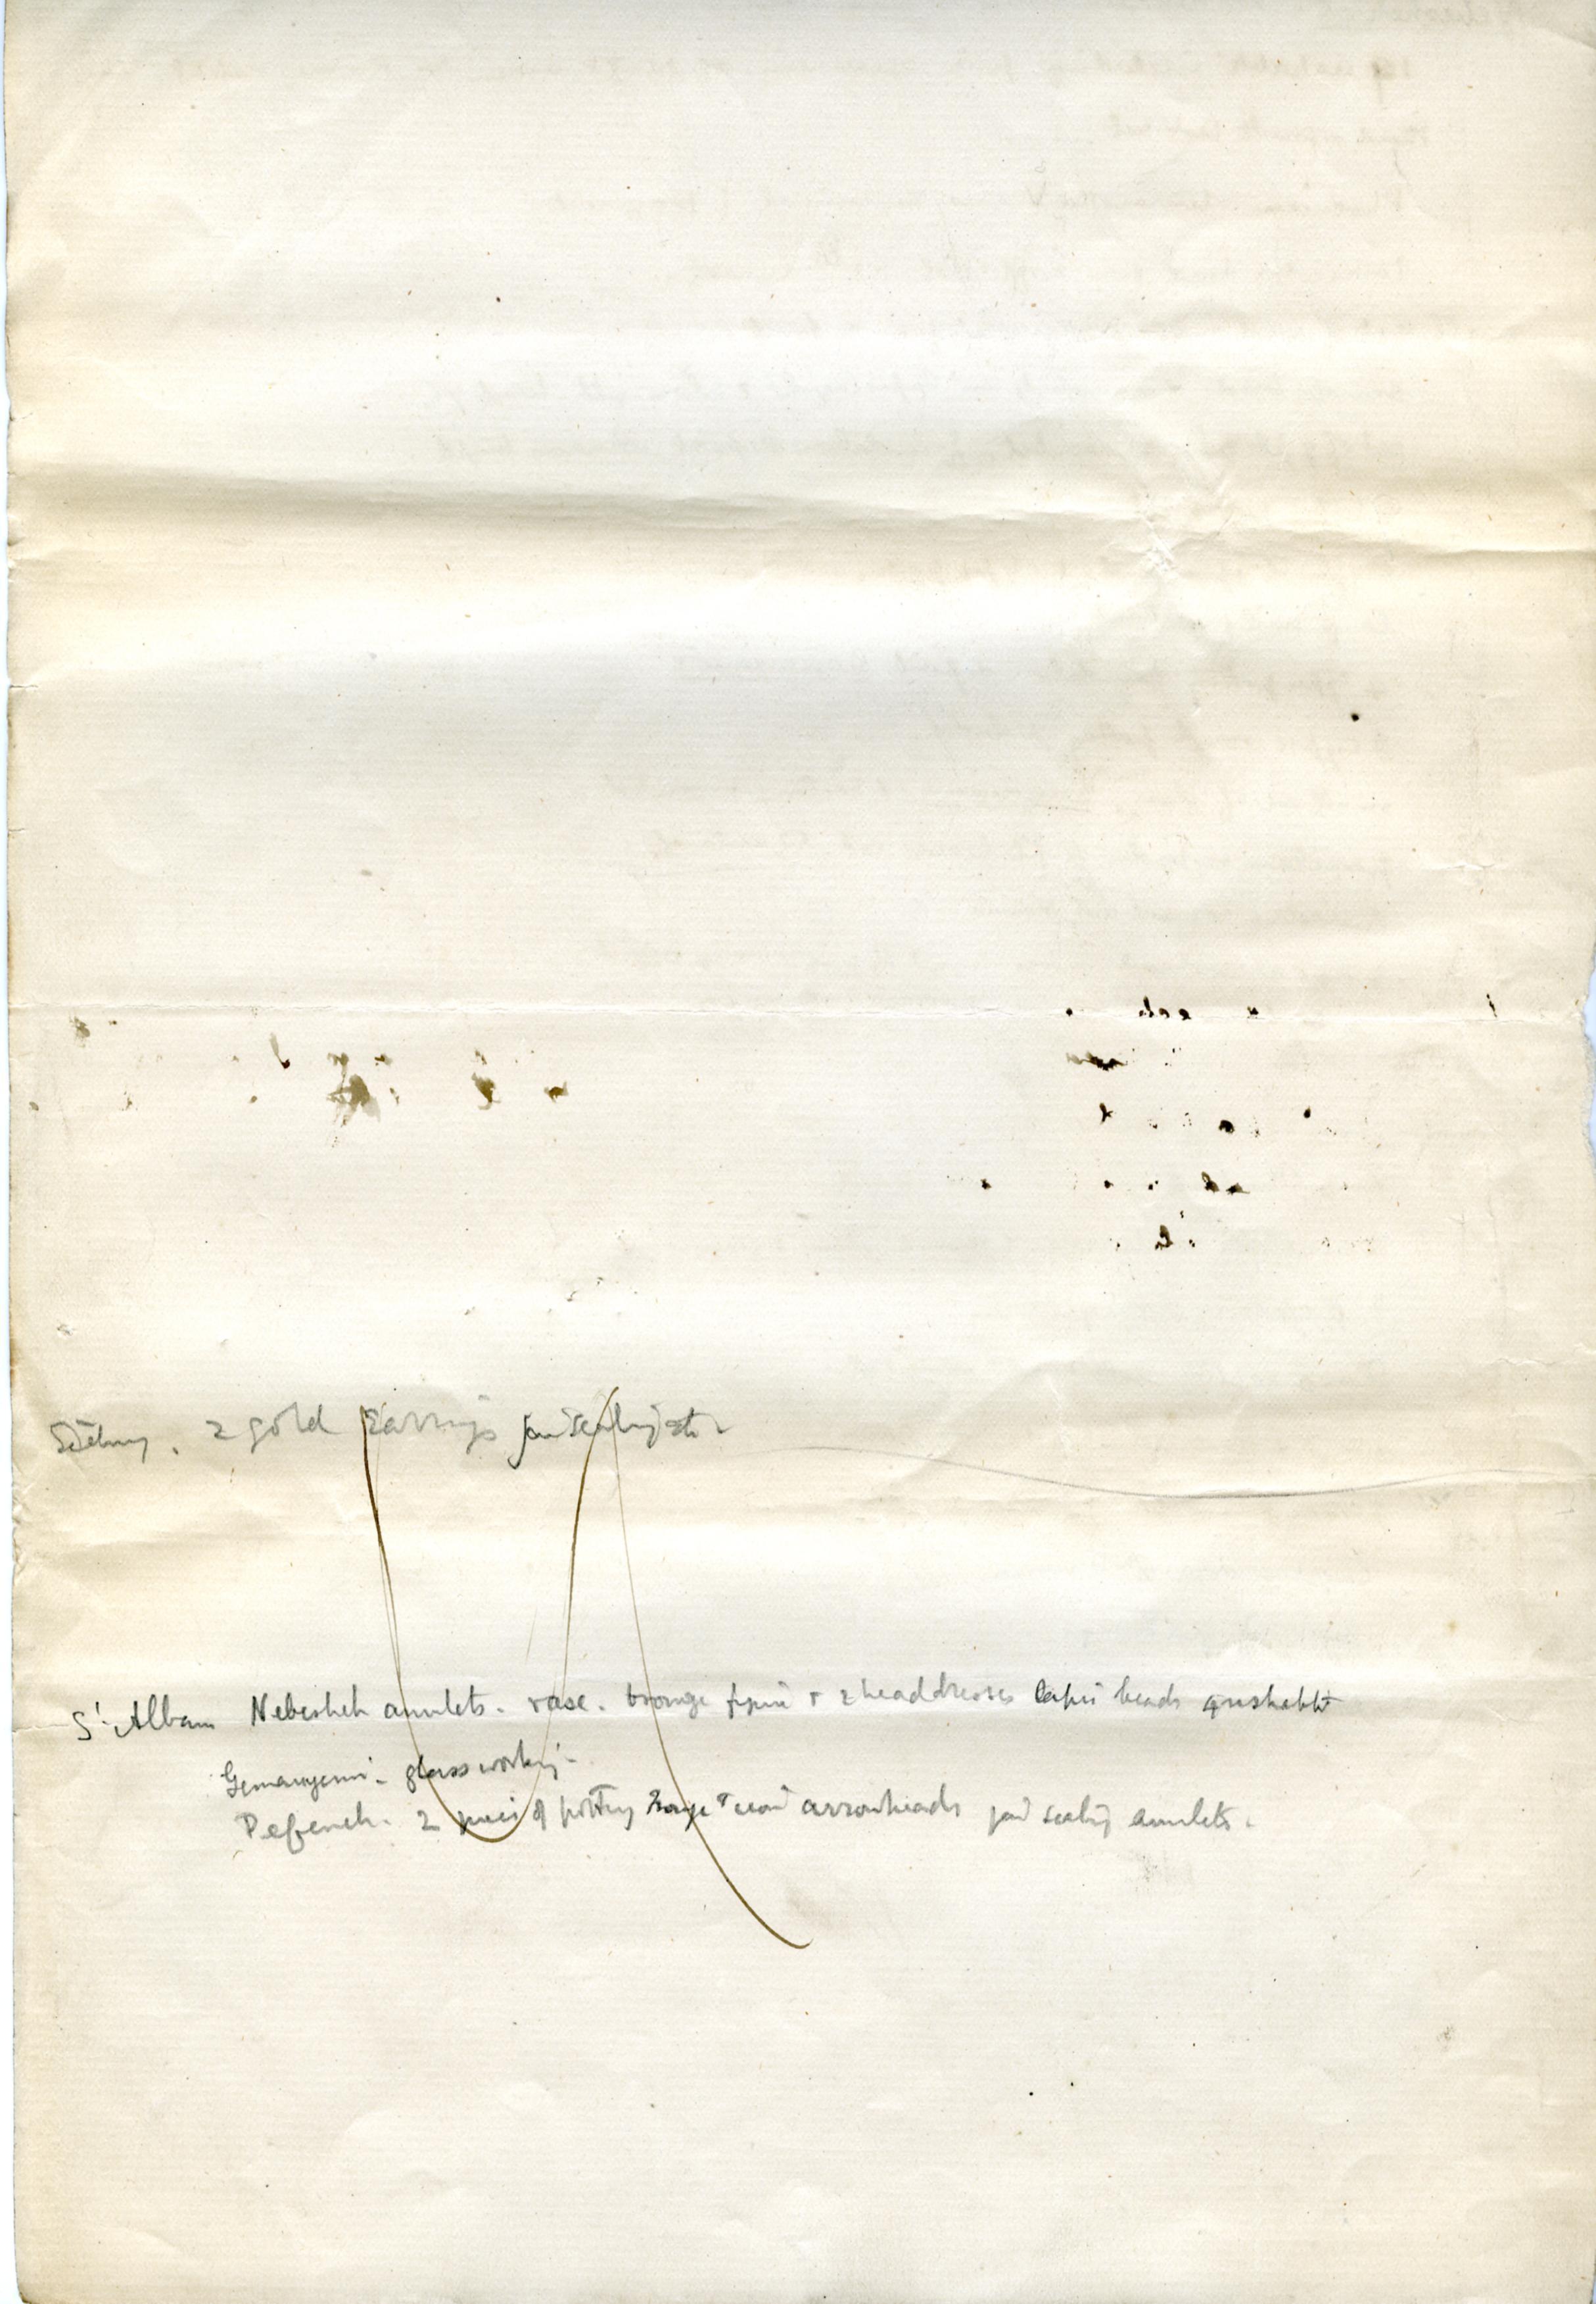 1886 Nebesheh Tell Dafana 1884 el-Qantara, Tell Gemayemi, Tell Sueilin DIST.09.03c